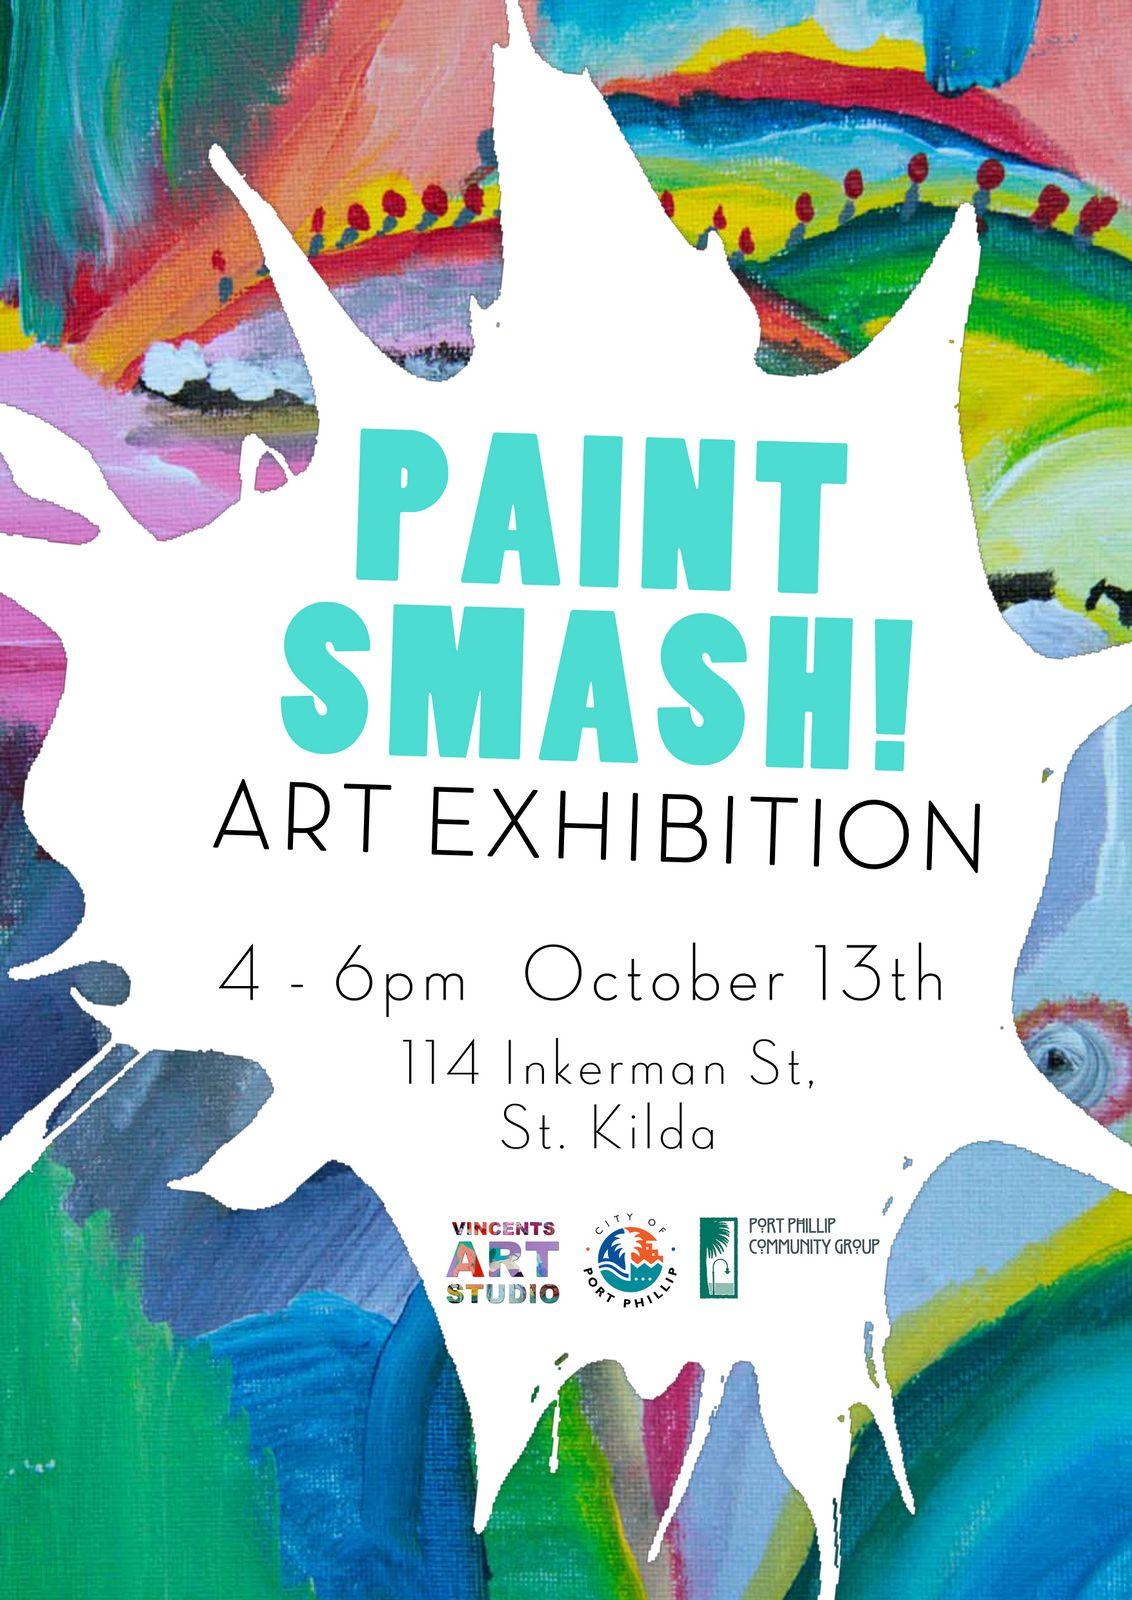 art exhibition posters exhibition